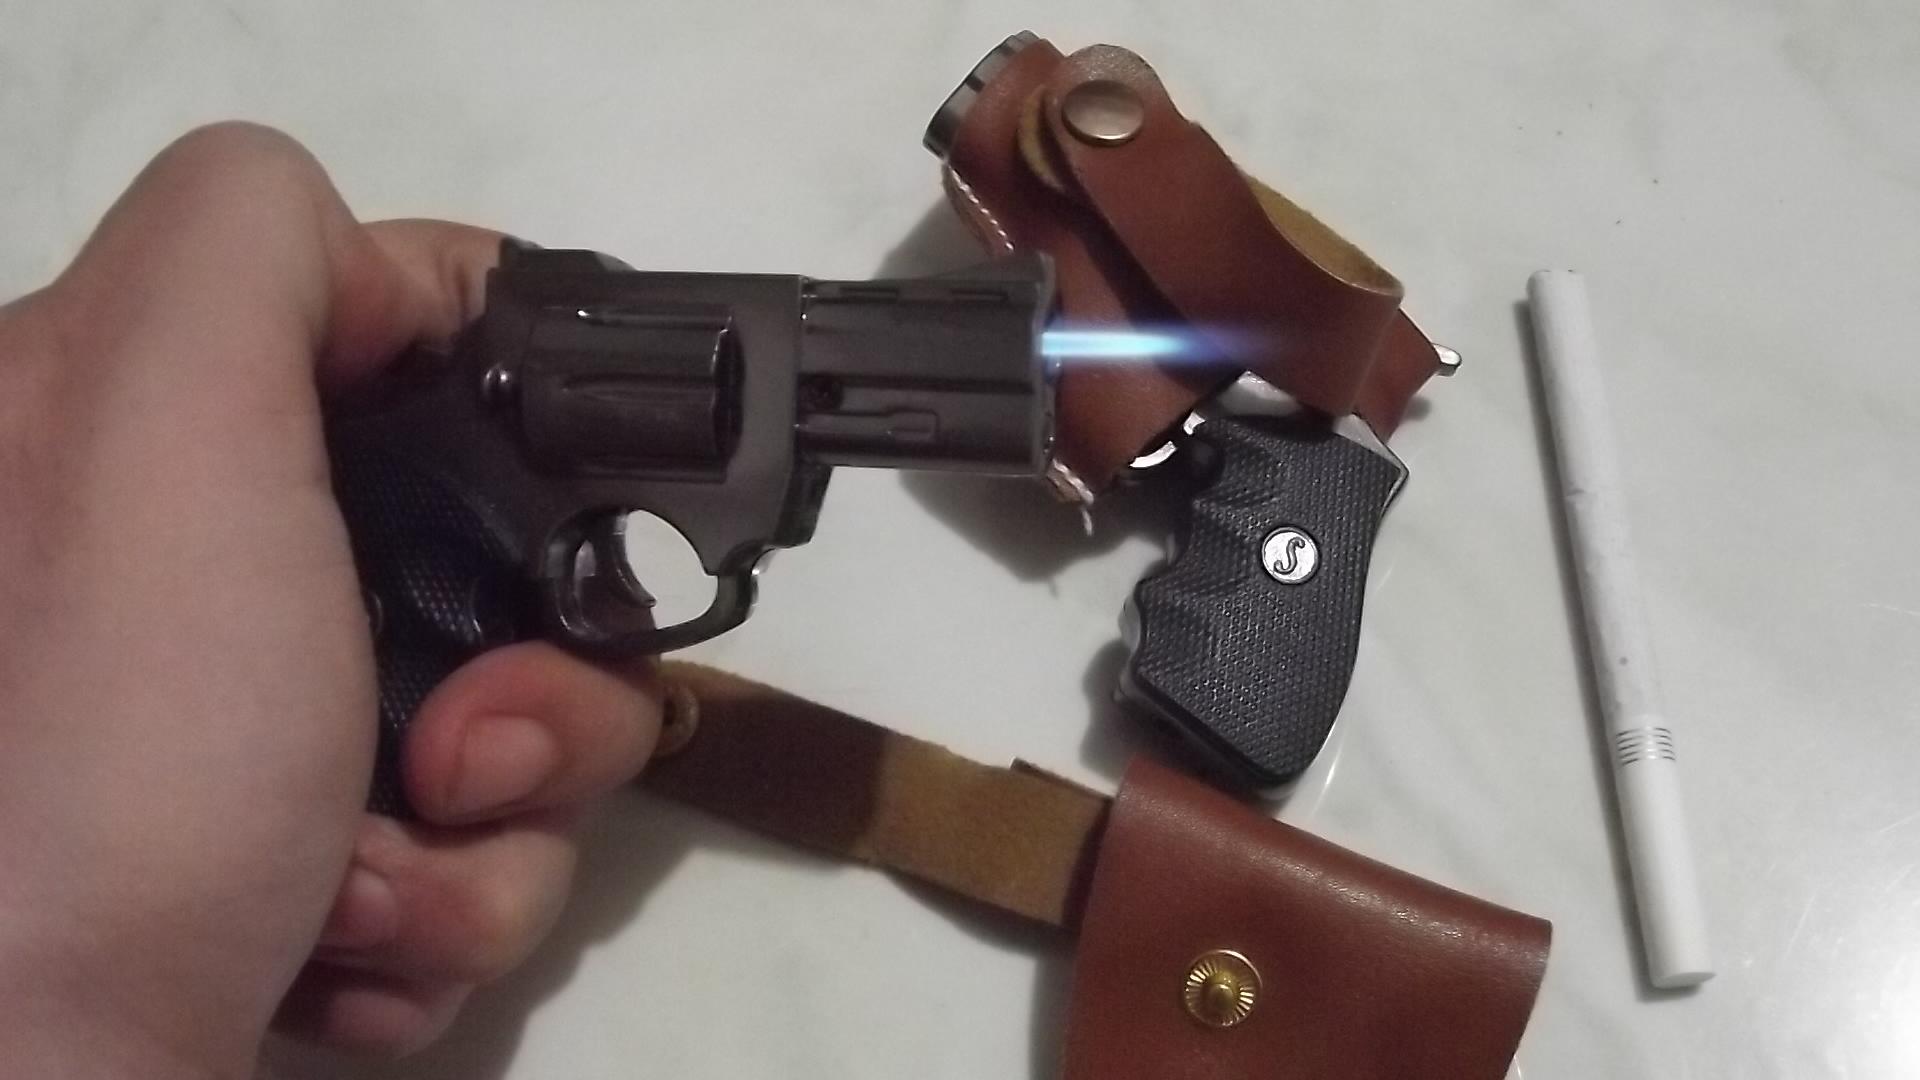 Jual Korek Api Model Pistol Phyton Revolver Mini Sarung Led Iphone 6 Linshopz Tokopedia